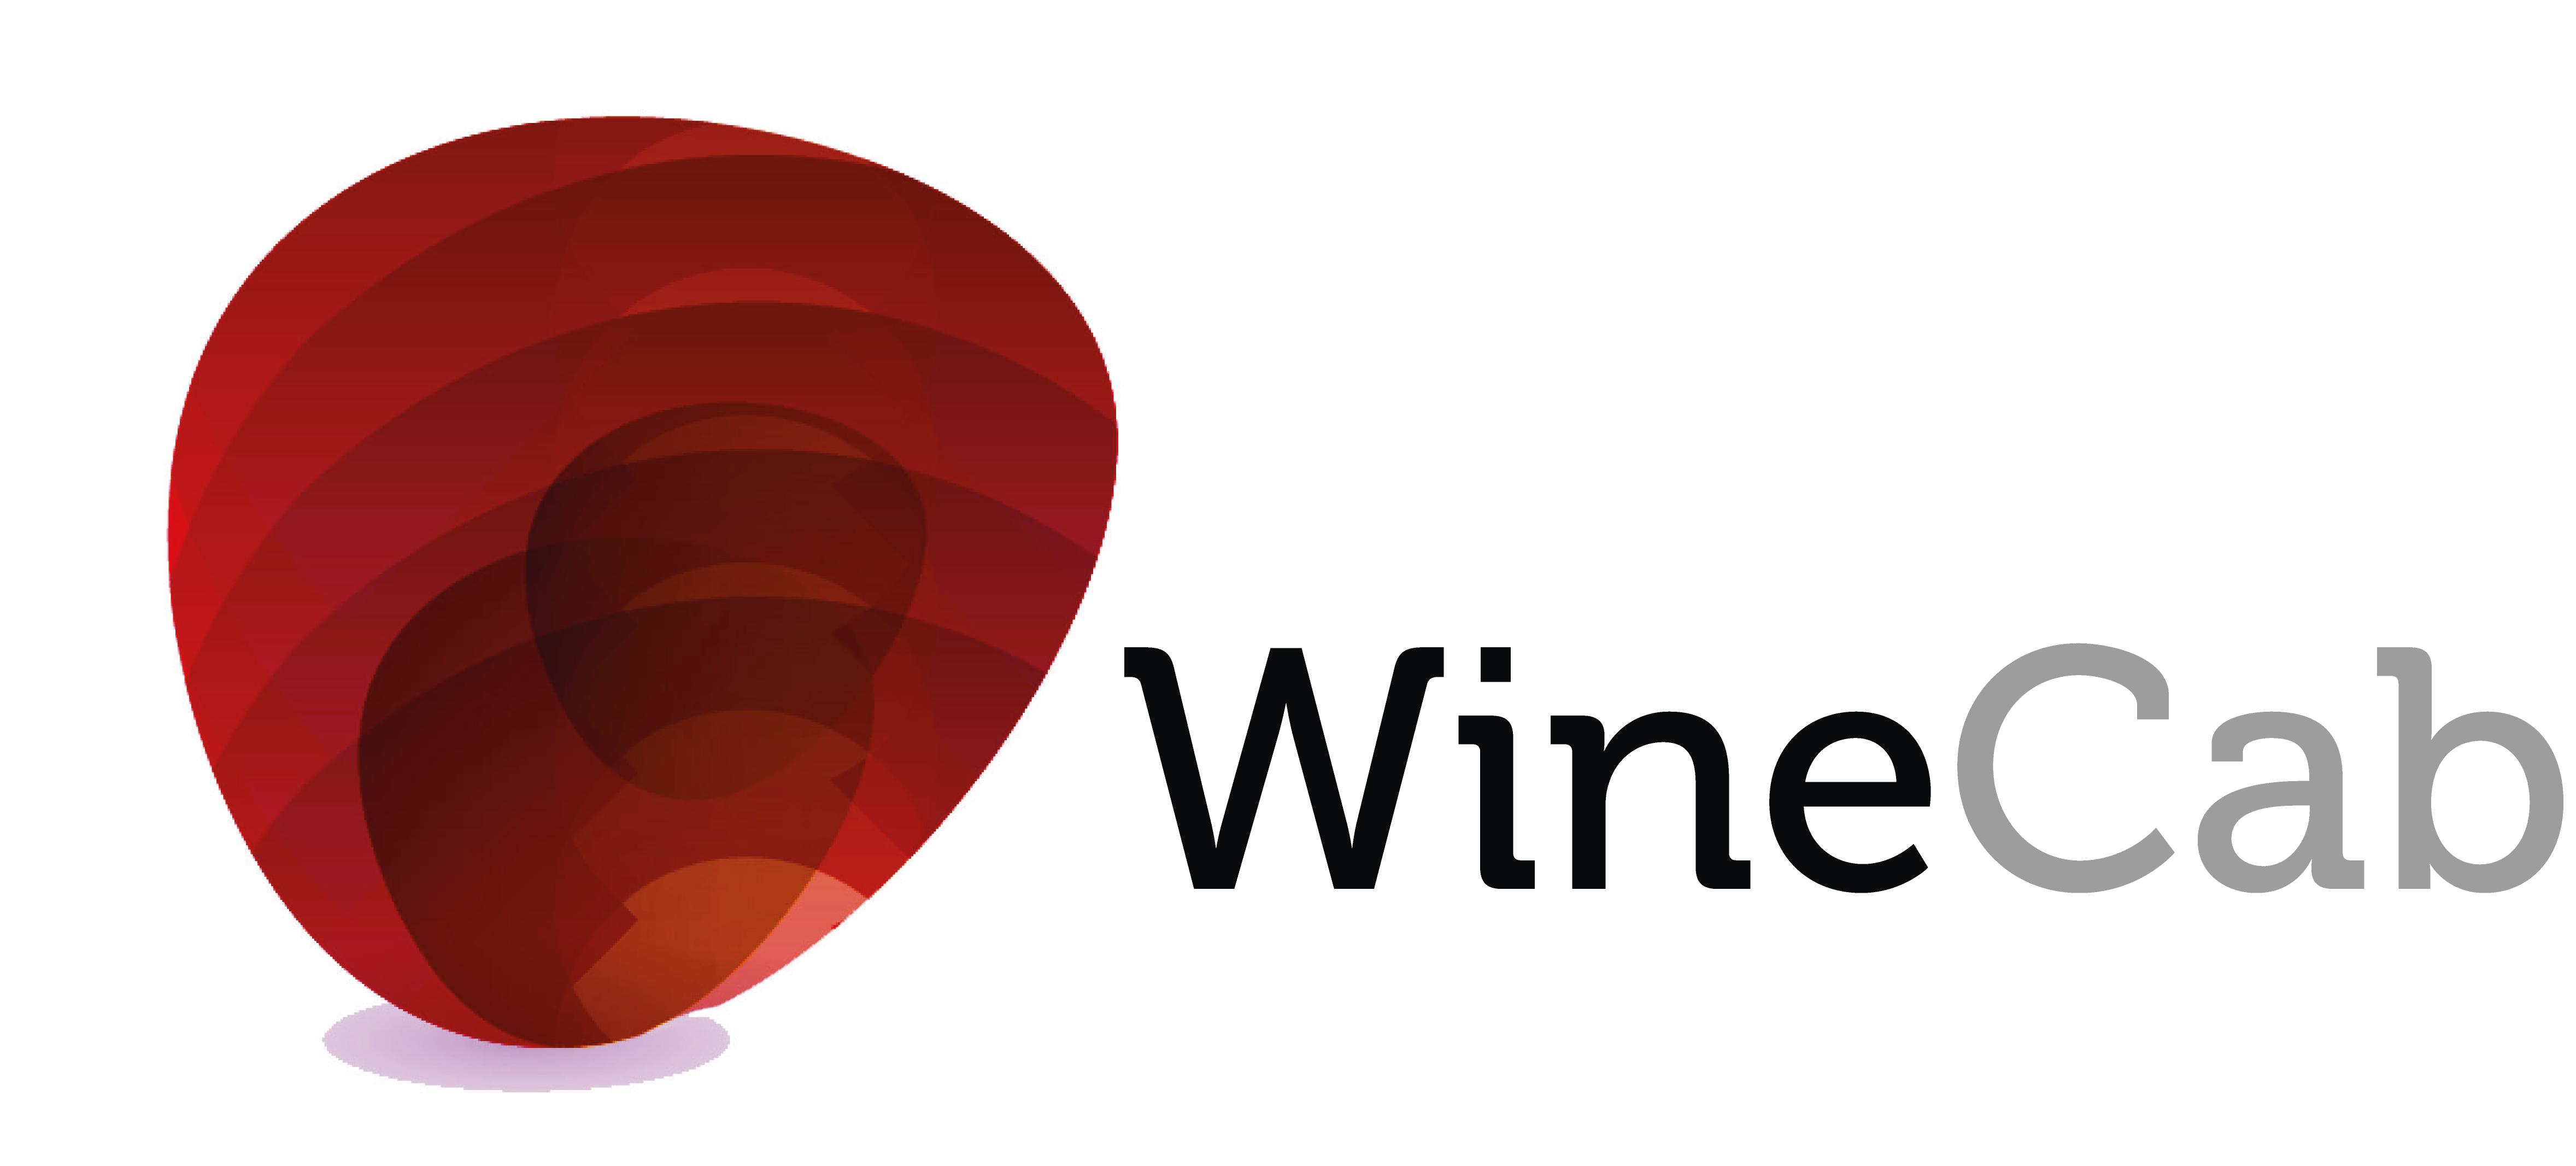 WineCab